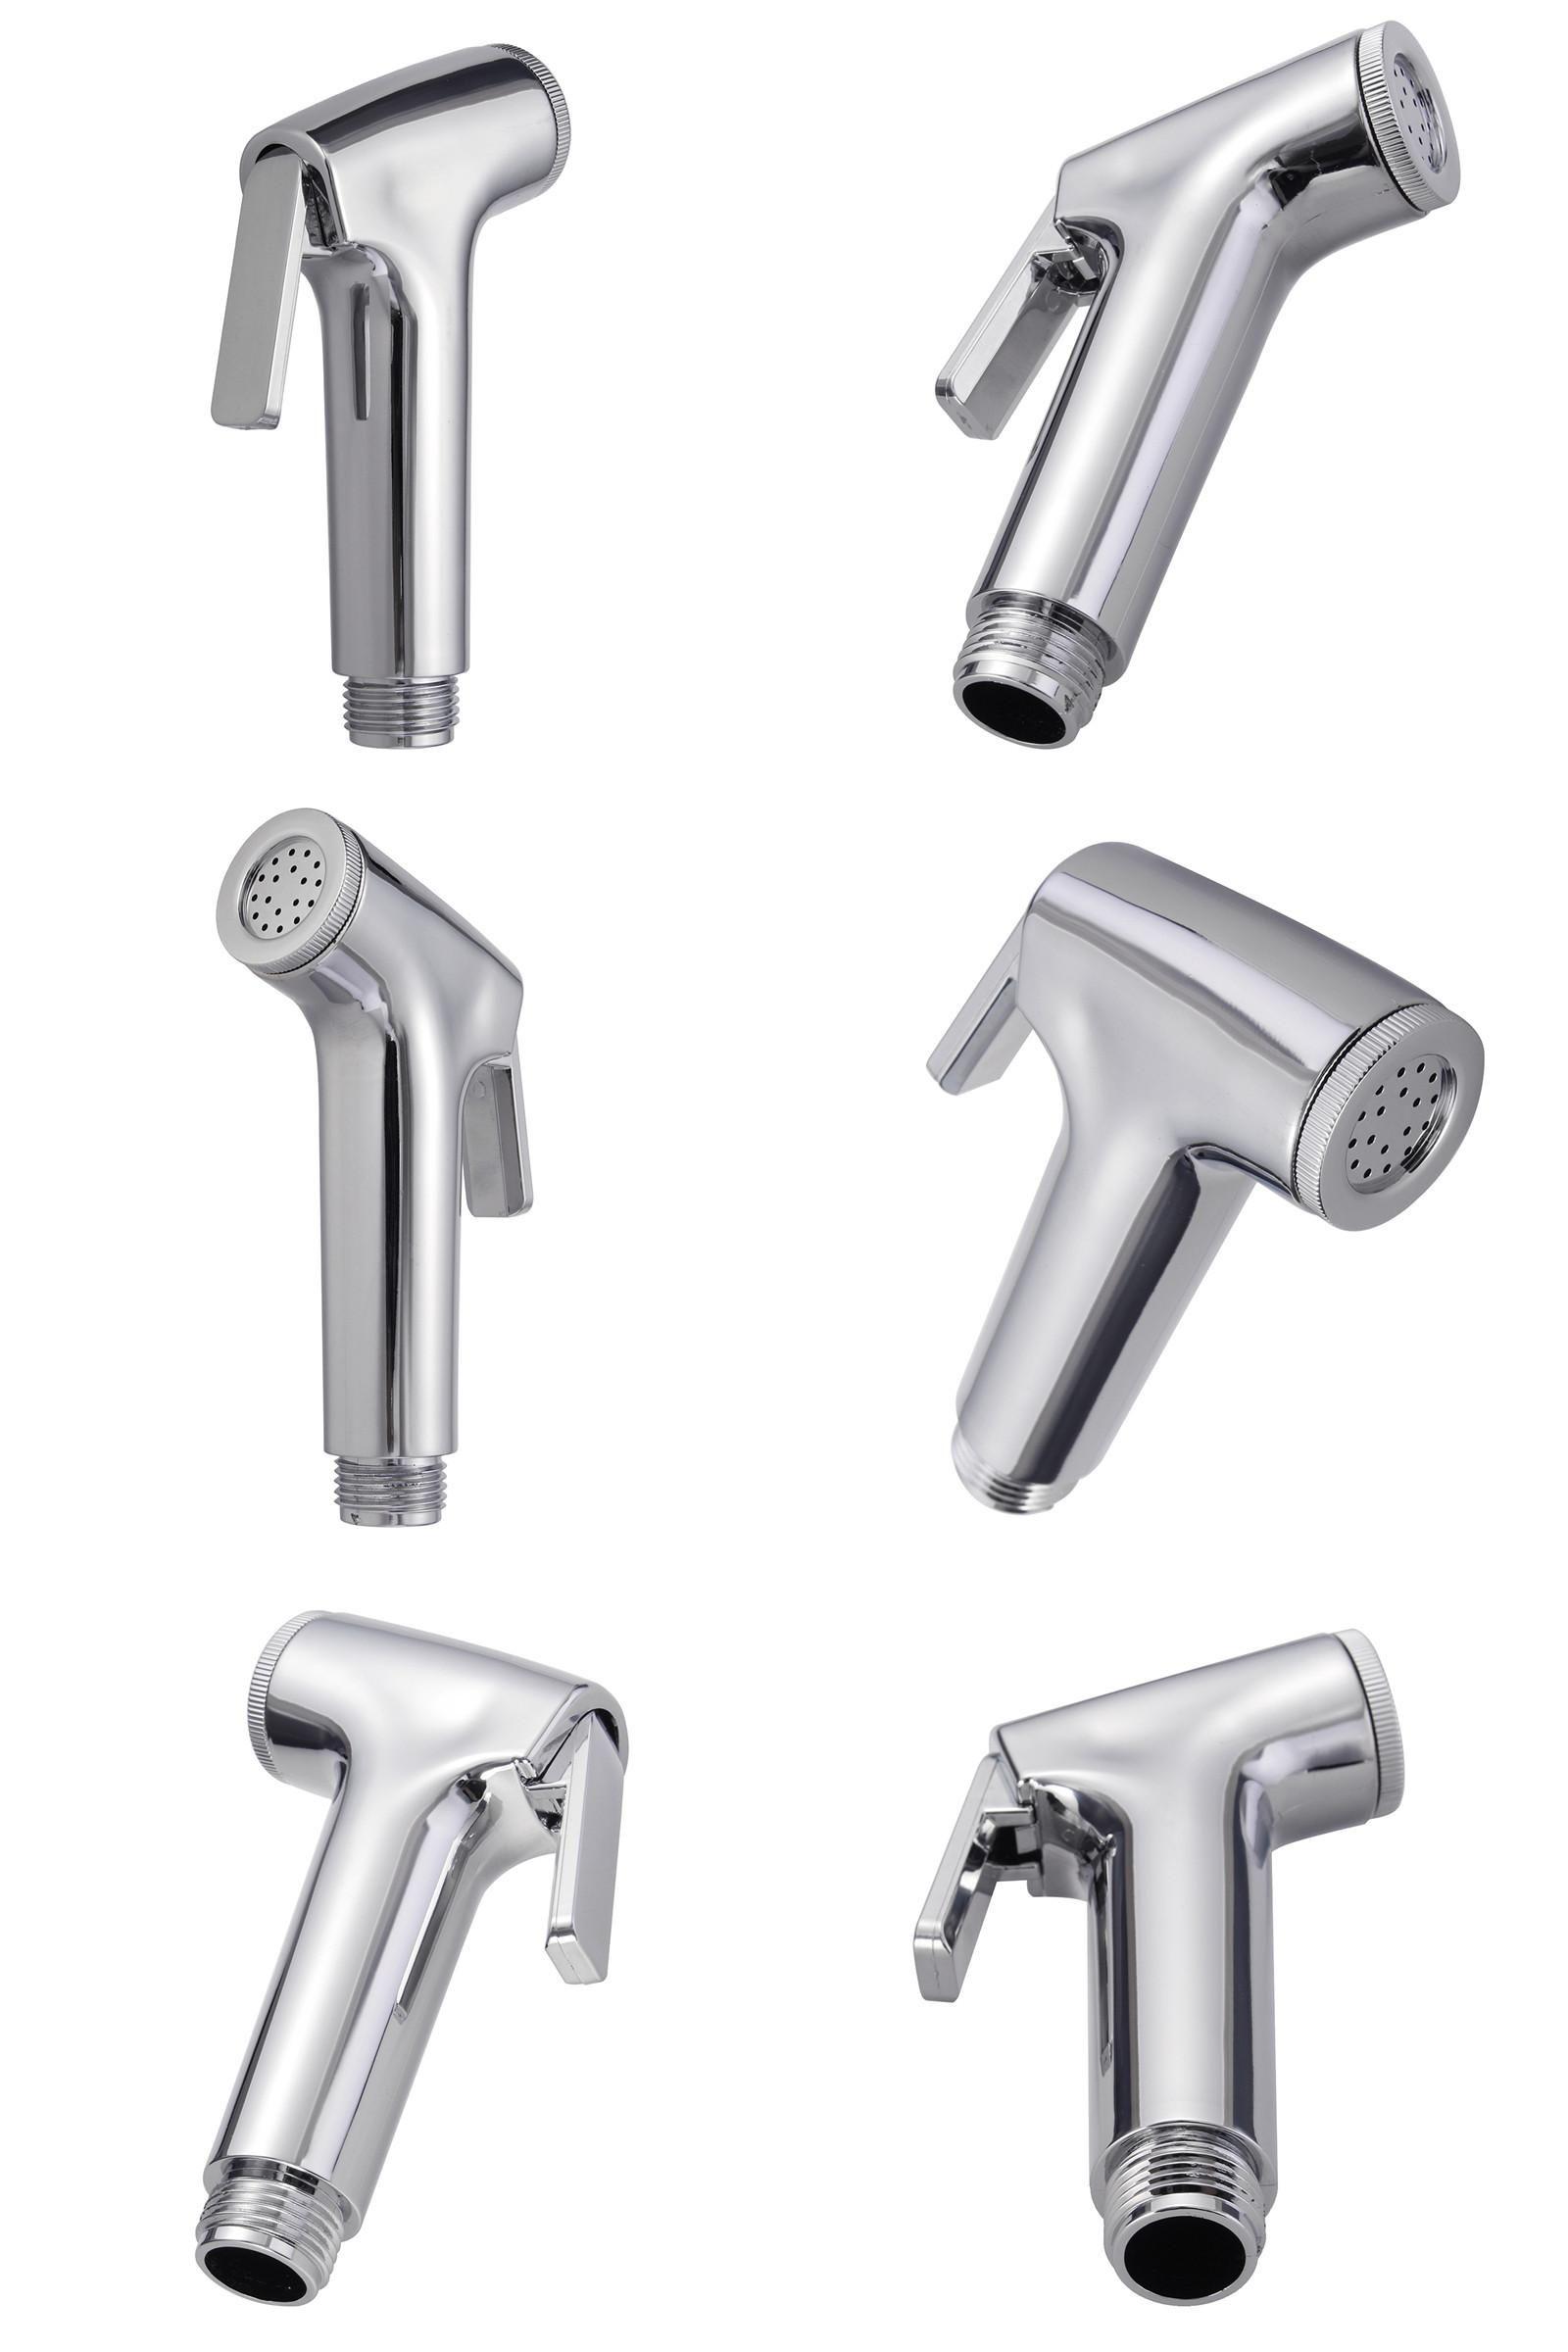 Visit To Buy 1pc Handheld Bathrom Toilet Sprayer Bidet Flushing Bidet Flusher Shower Head Nozzle Wall Mounted Body Bidet Shower Heads Cheap Toilets